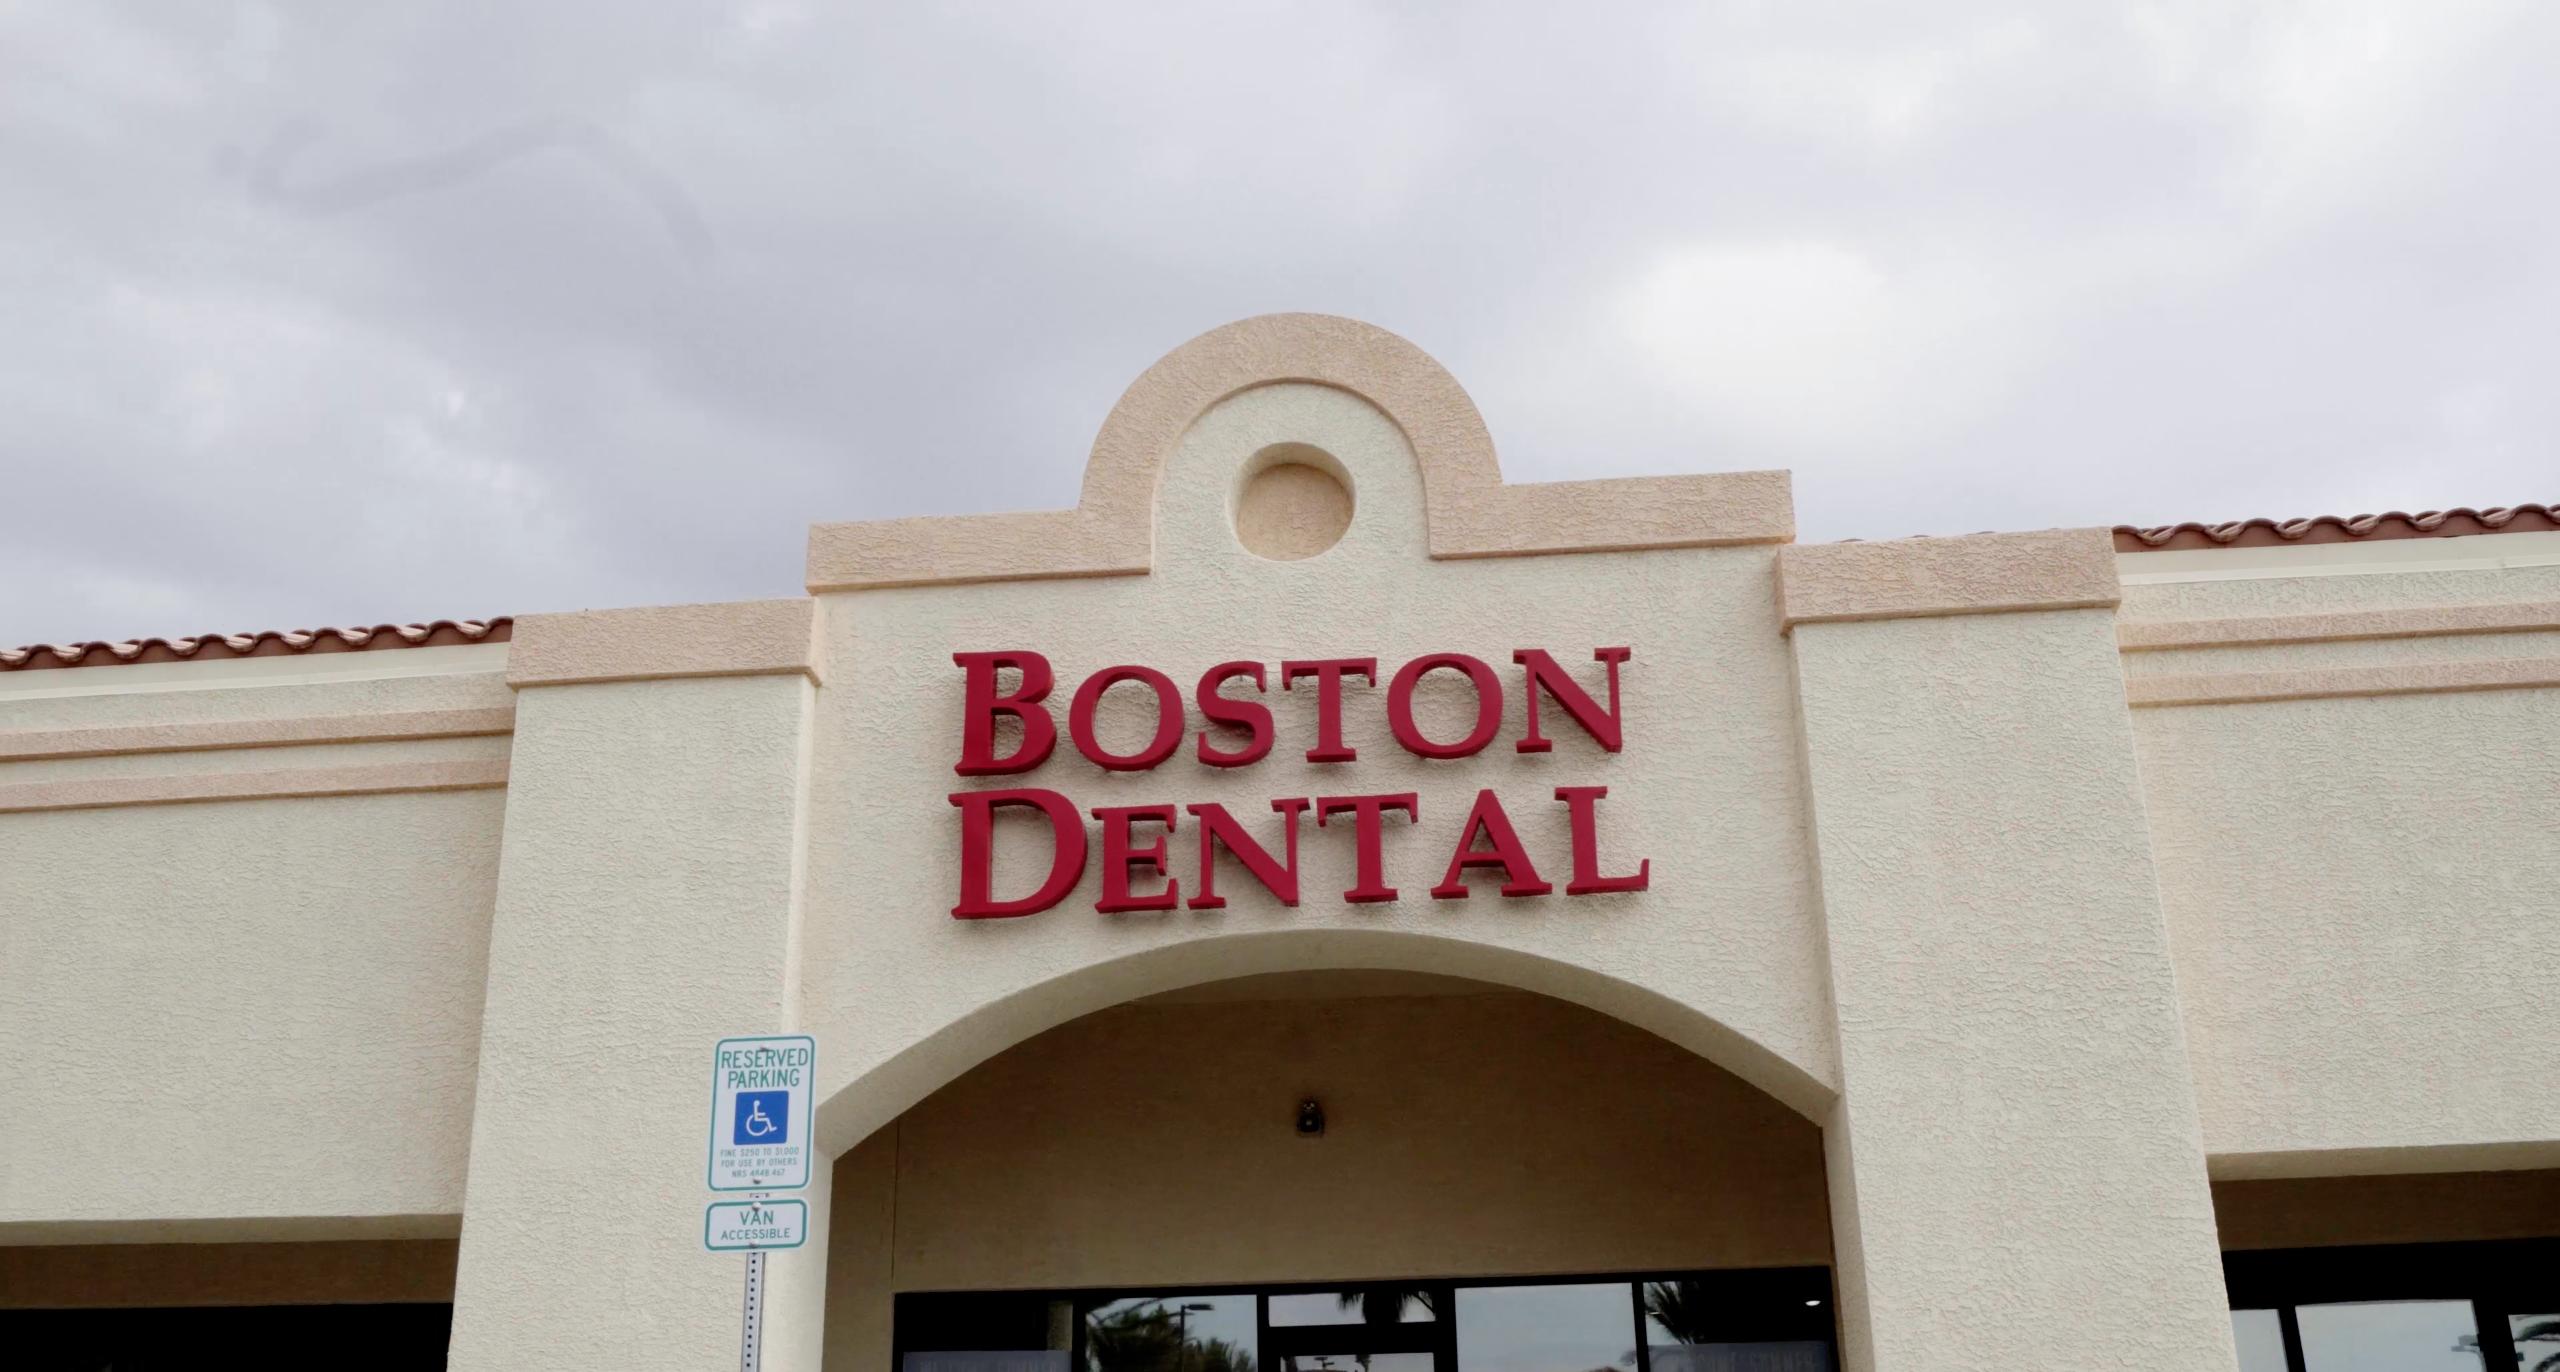 Boston Dental